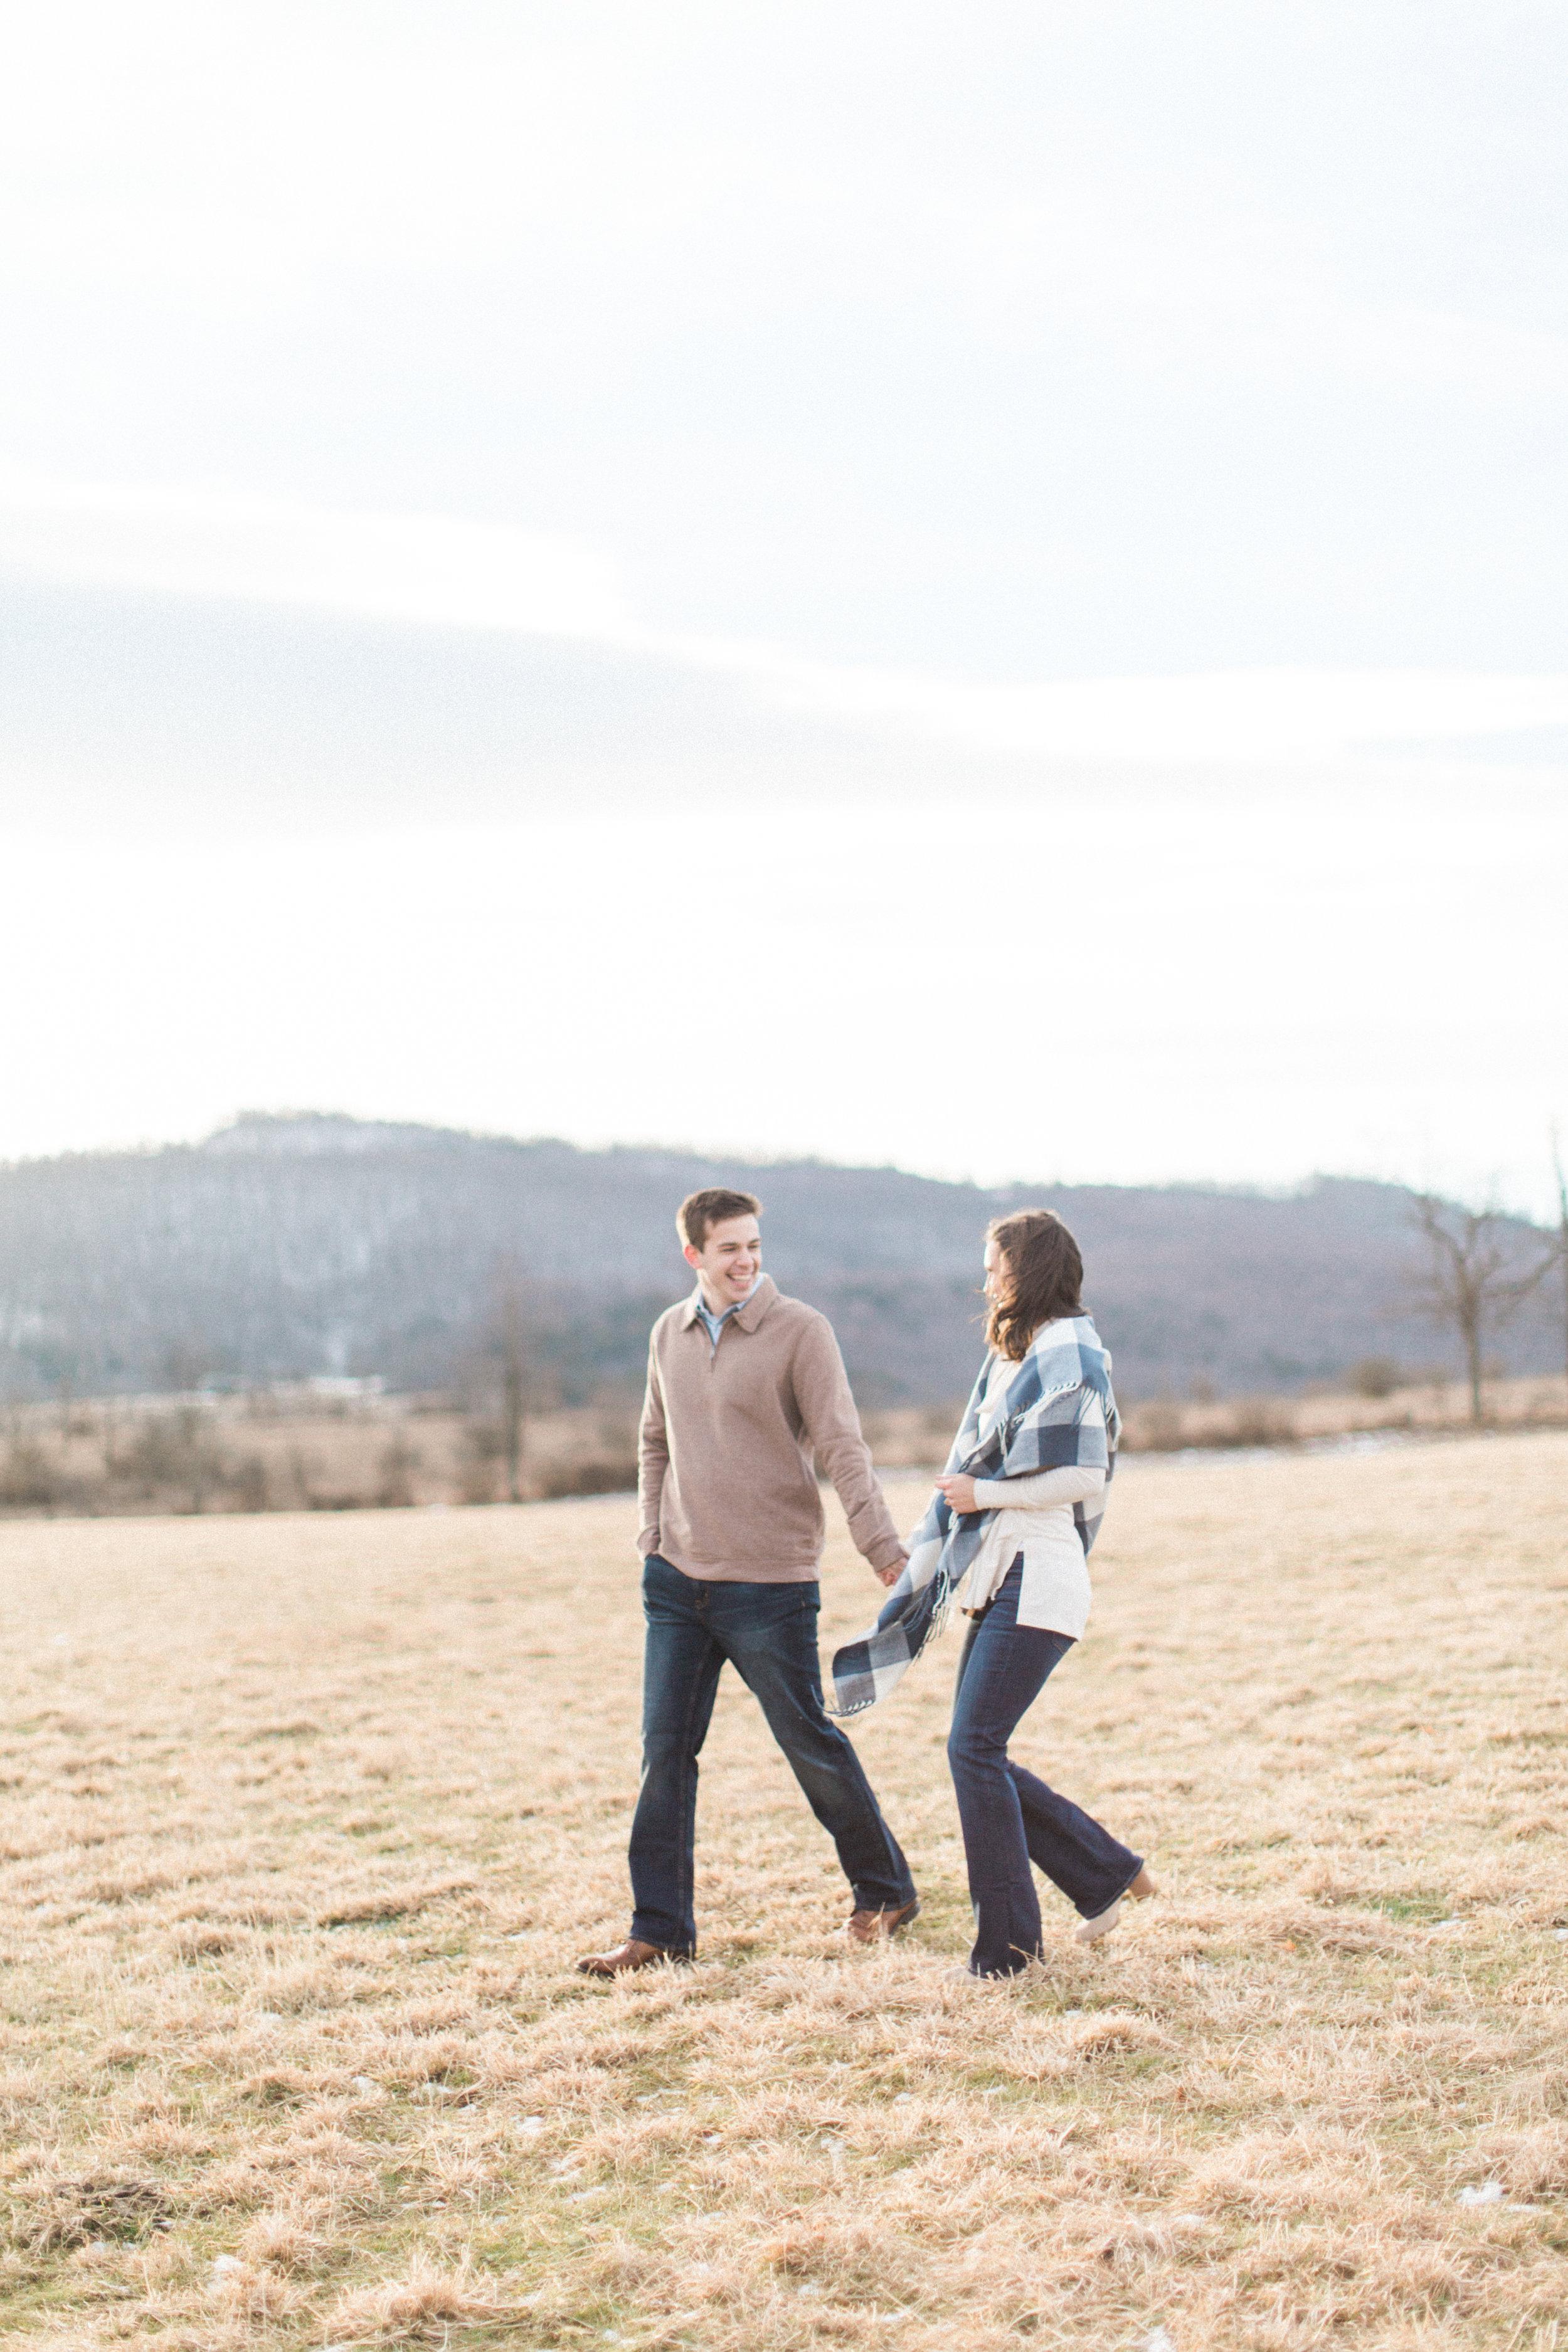 Abigail_Jill_Photography_Maryland_Engagement_Farm_Emily_Justin107.jpg